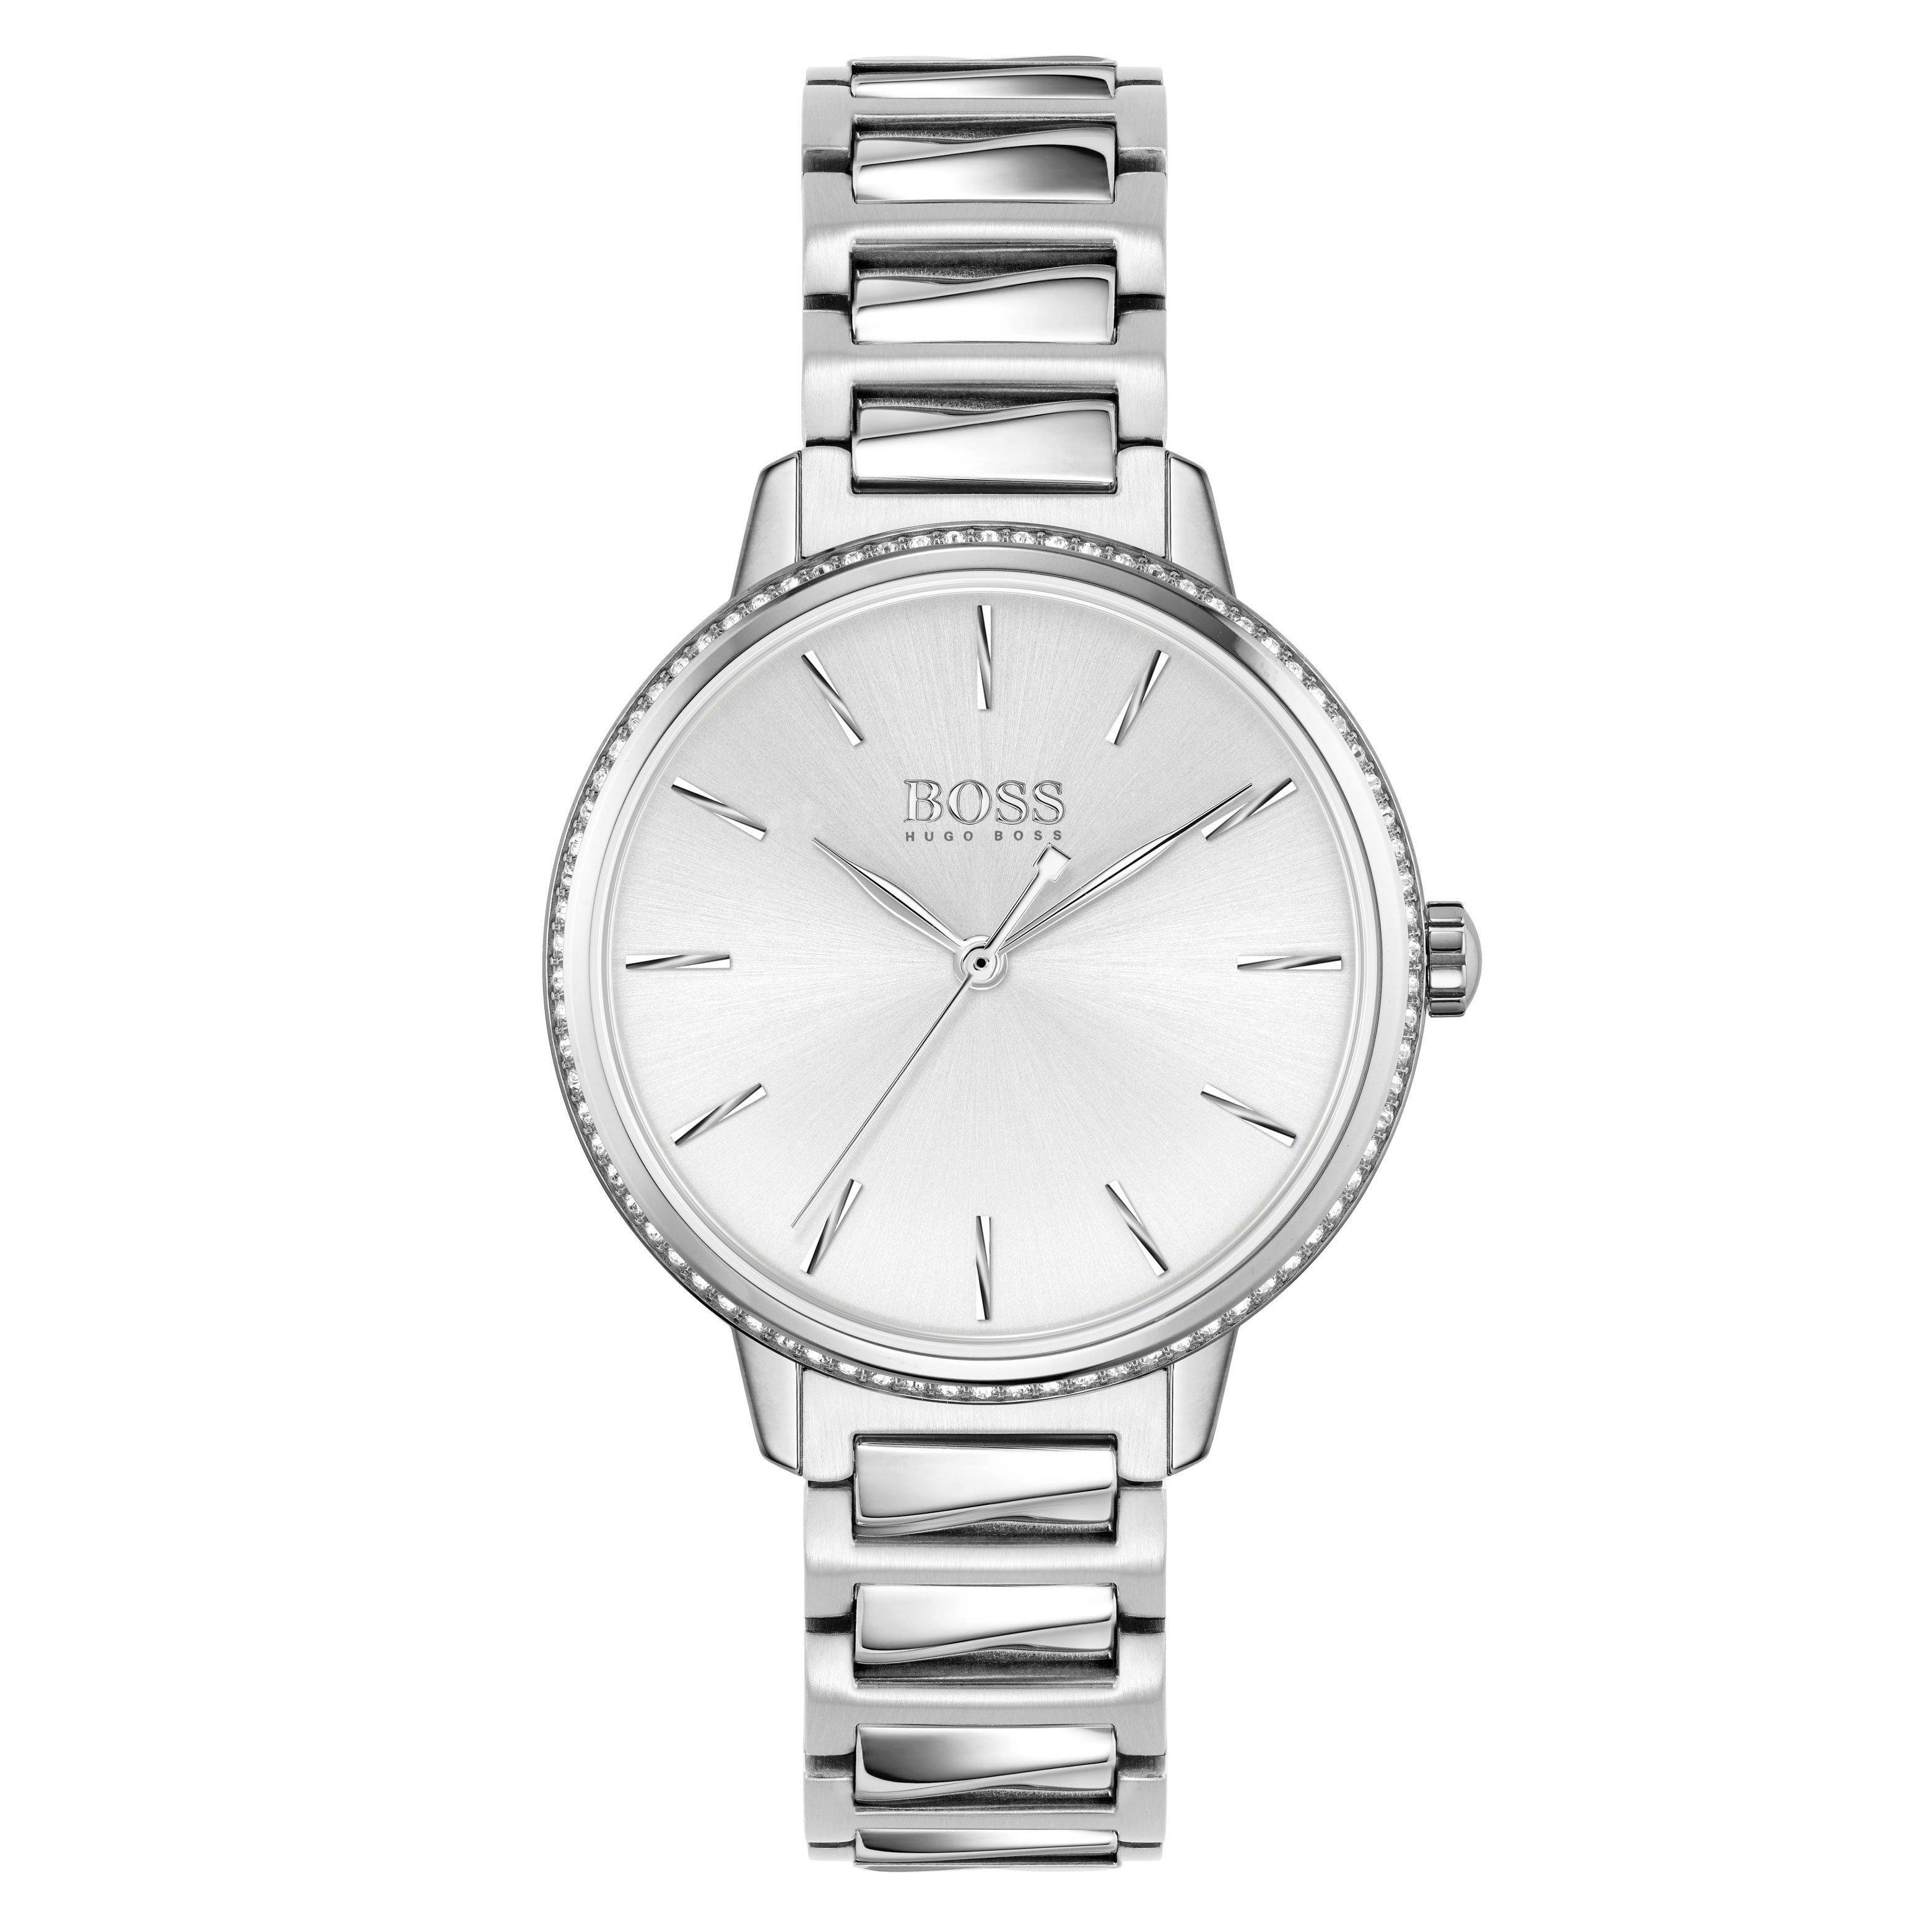 BOSS Signature Ladies Watch